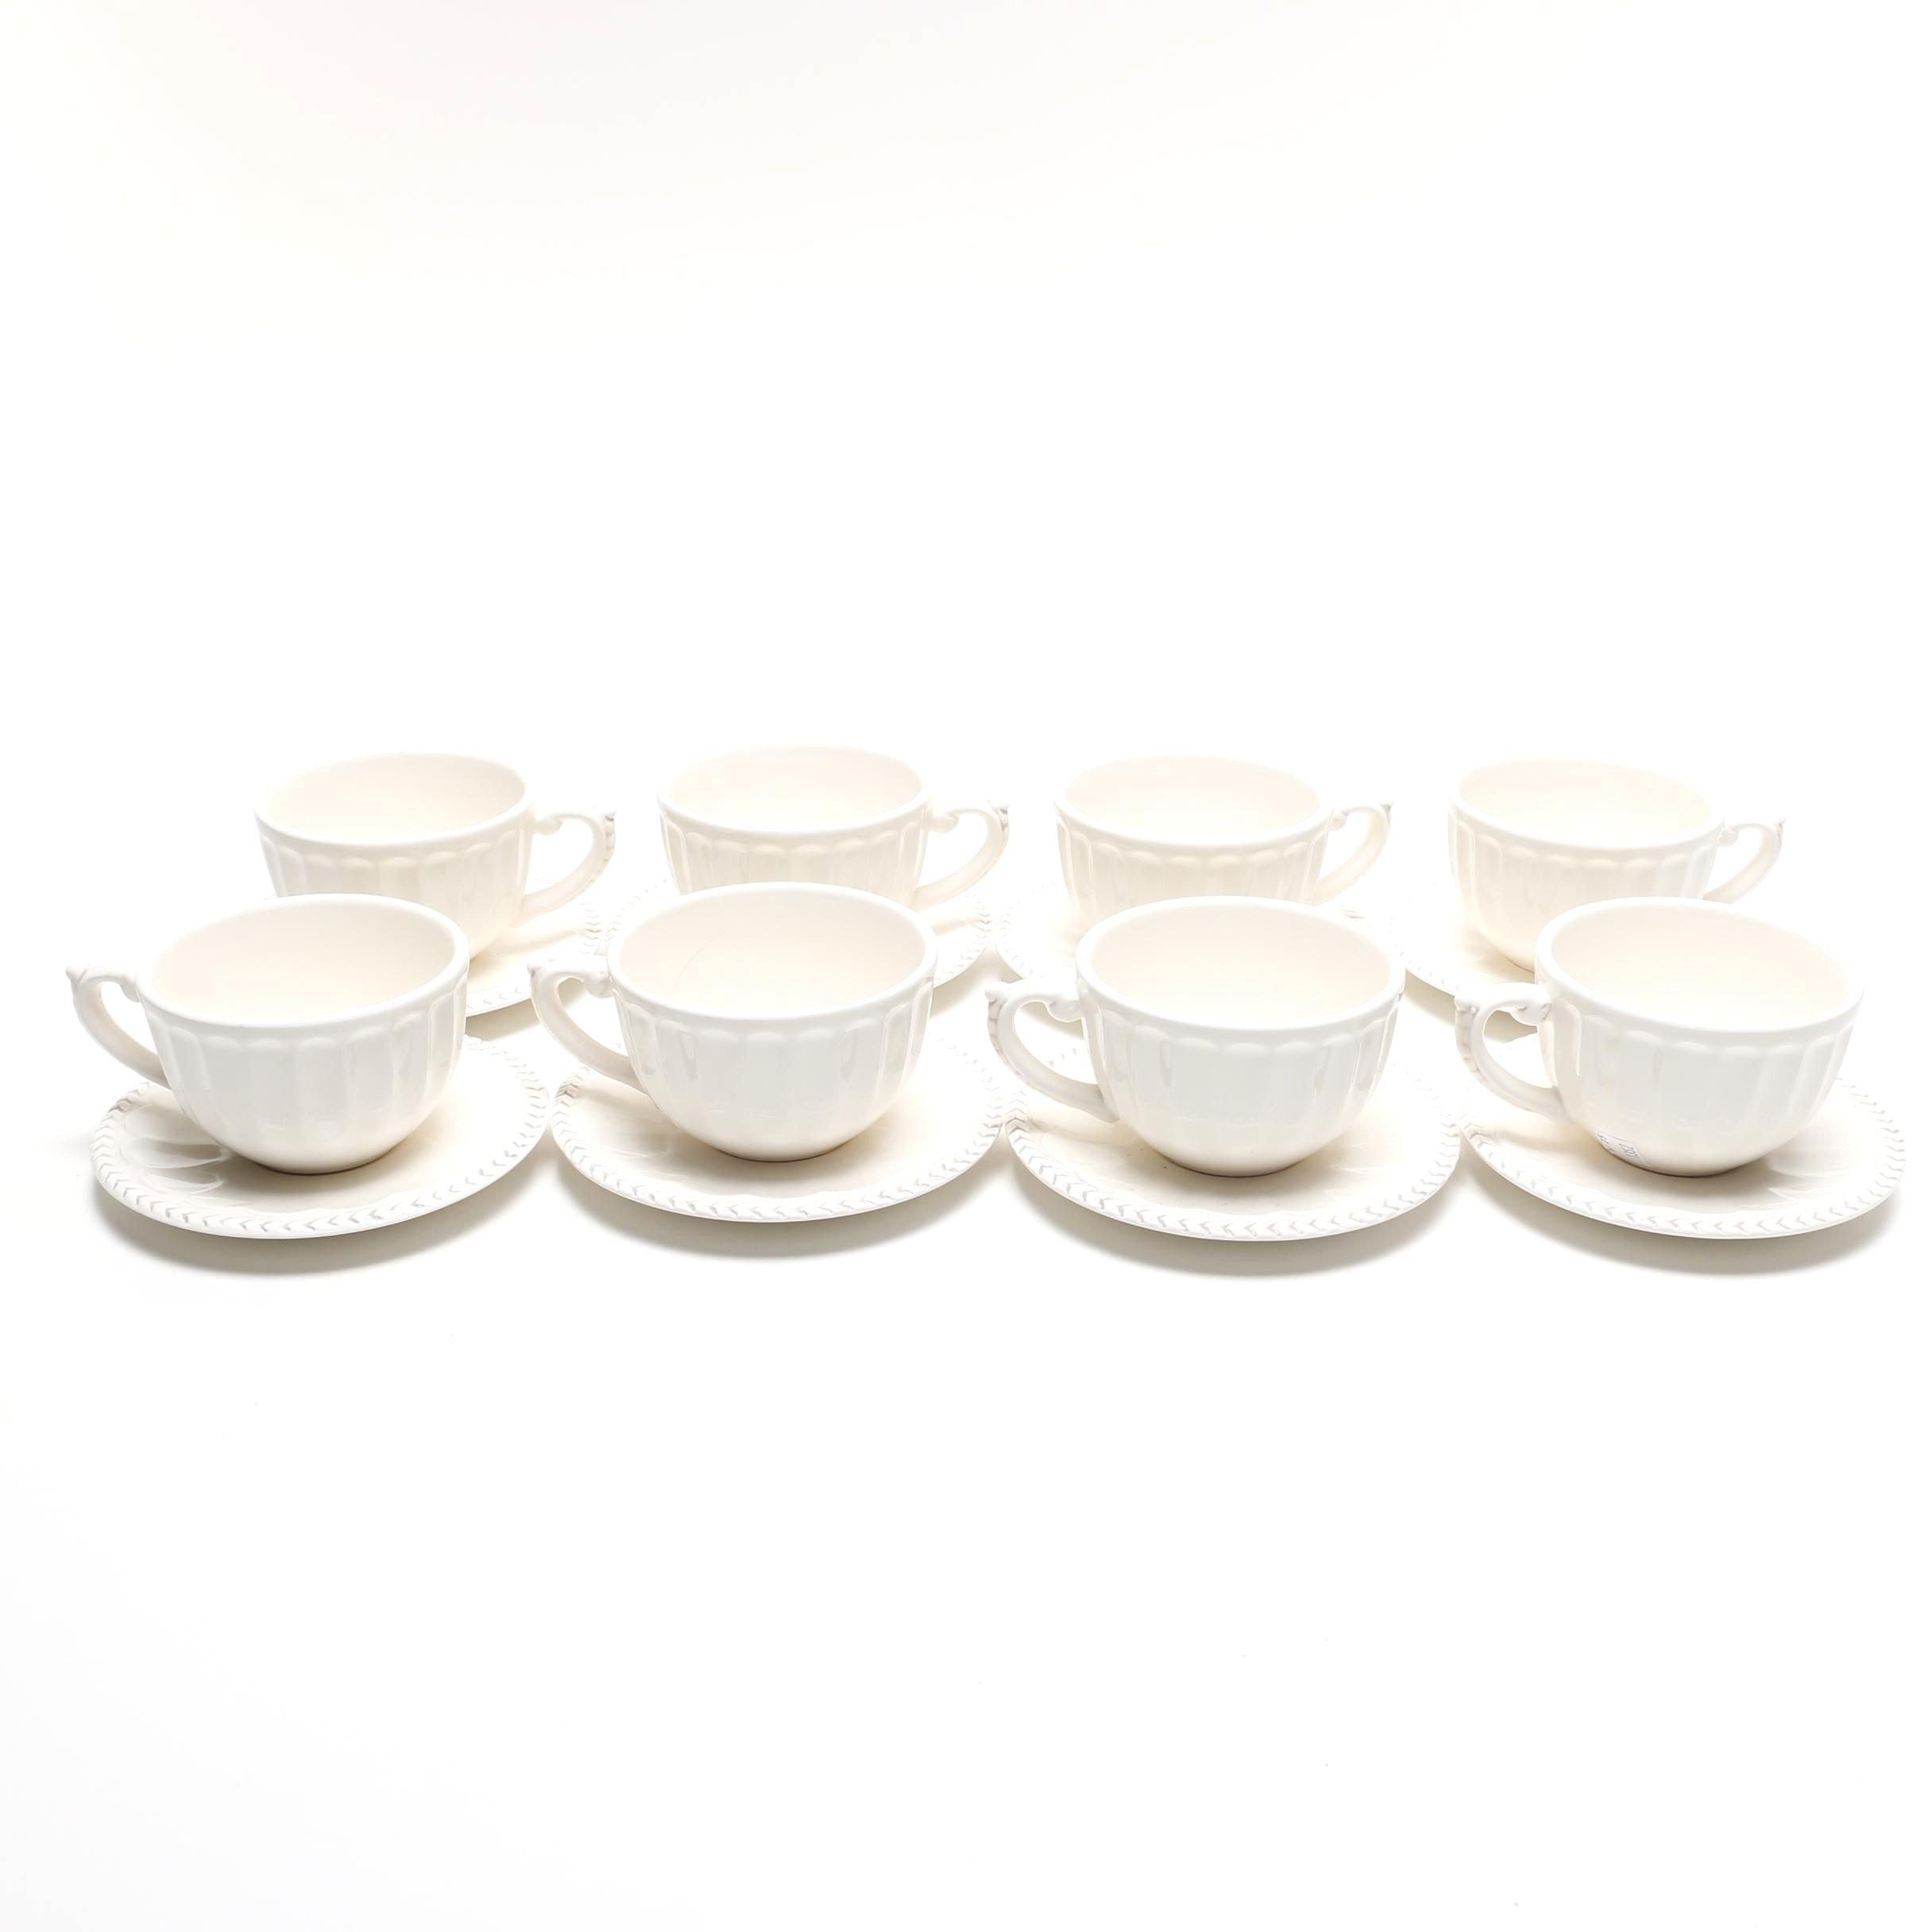 American Atelier  Athena  Ironstone Teaware ...  sc 1 st  EBTH.com & American Atelier